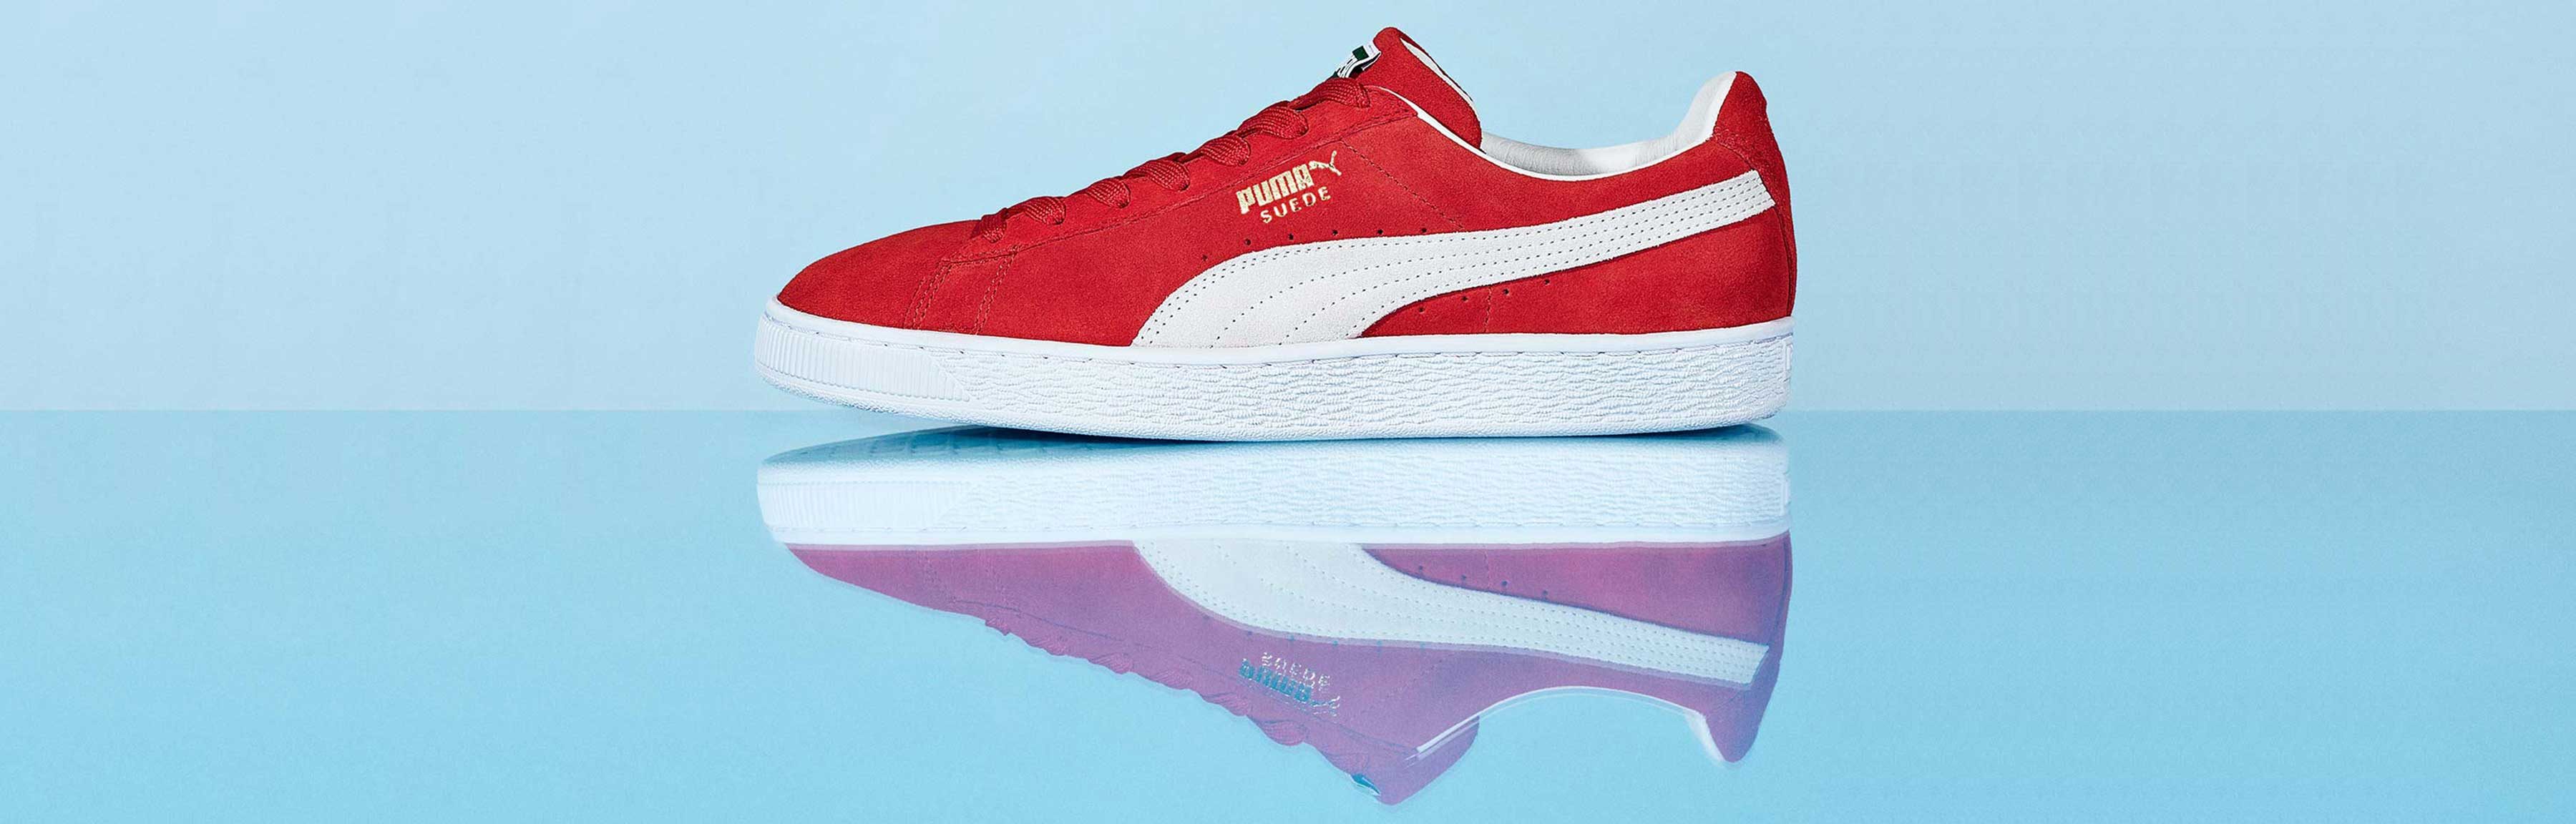 99563581522 Puma Suede Classic online kopen | Puma sneakers | Zalando